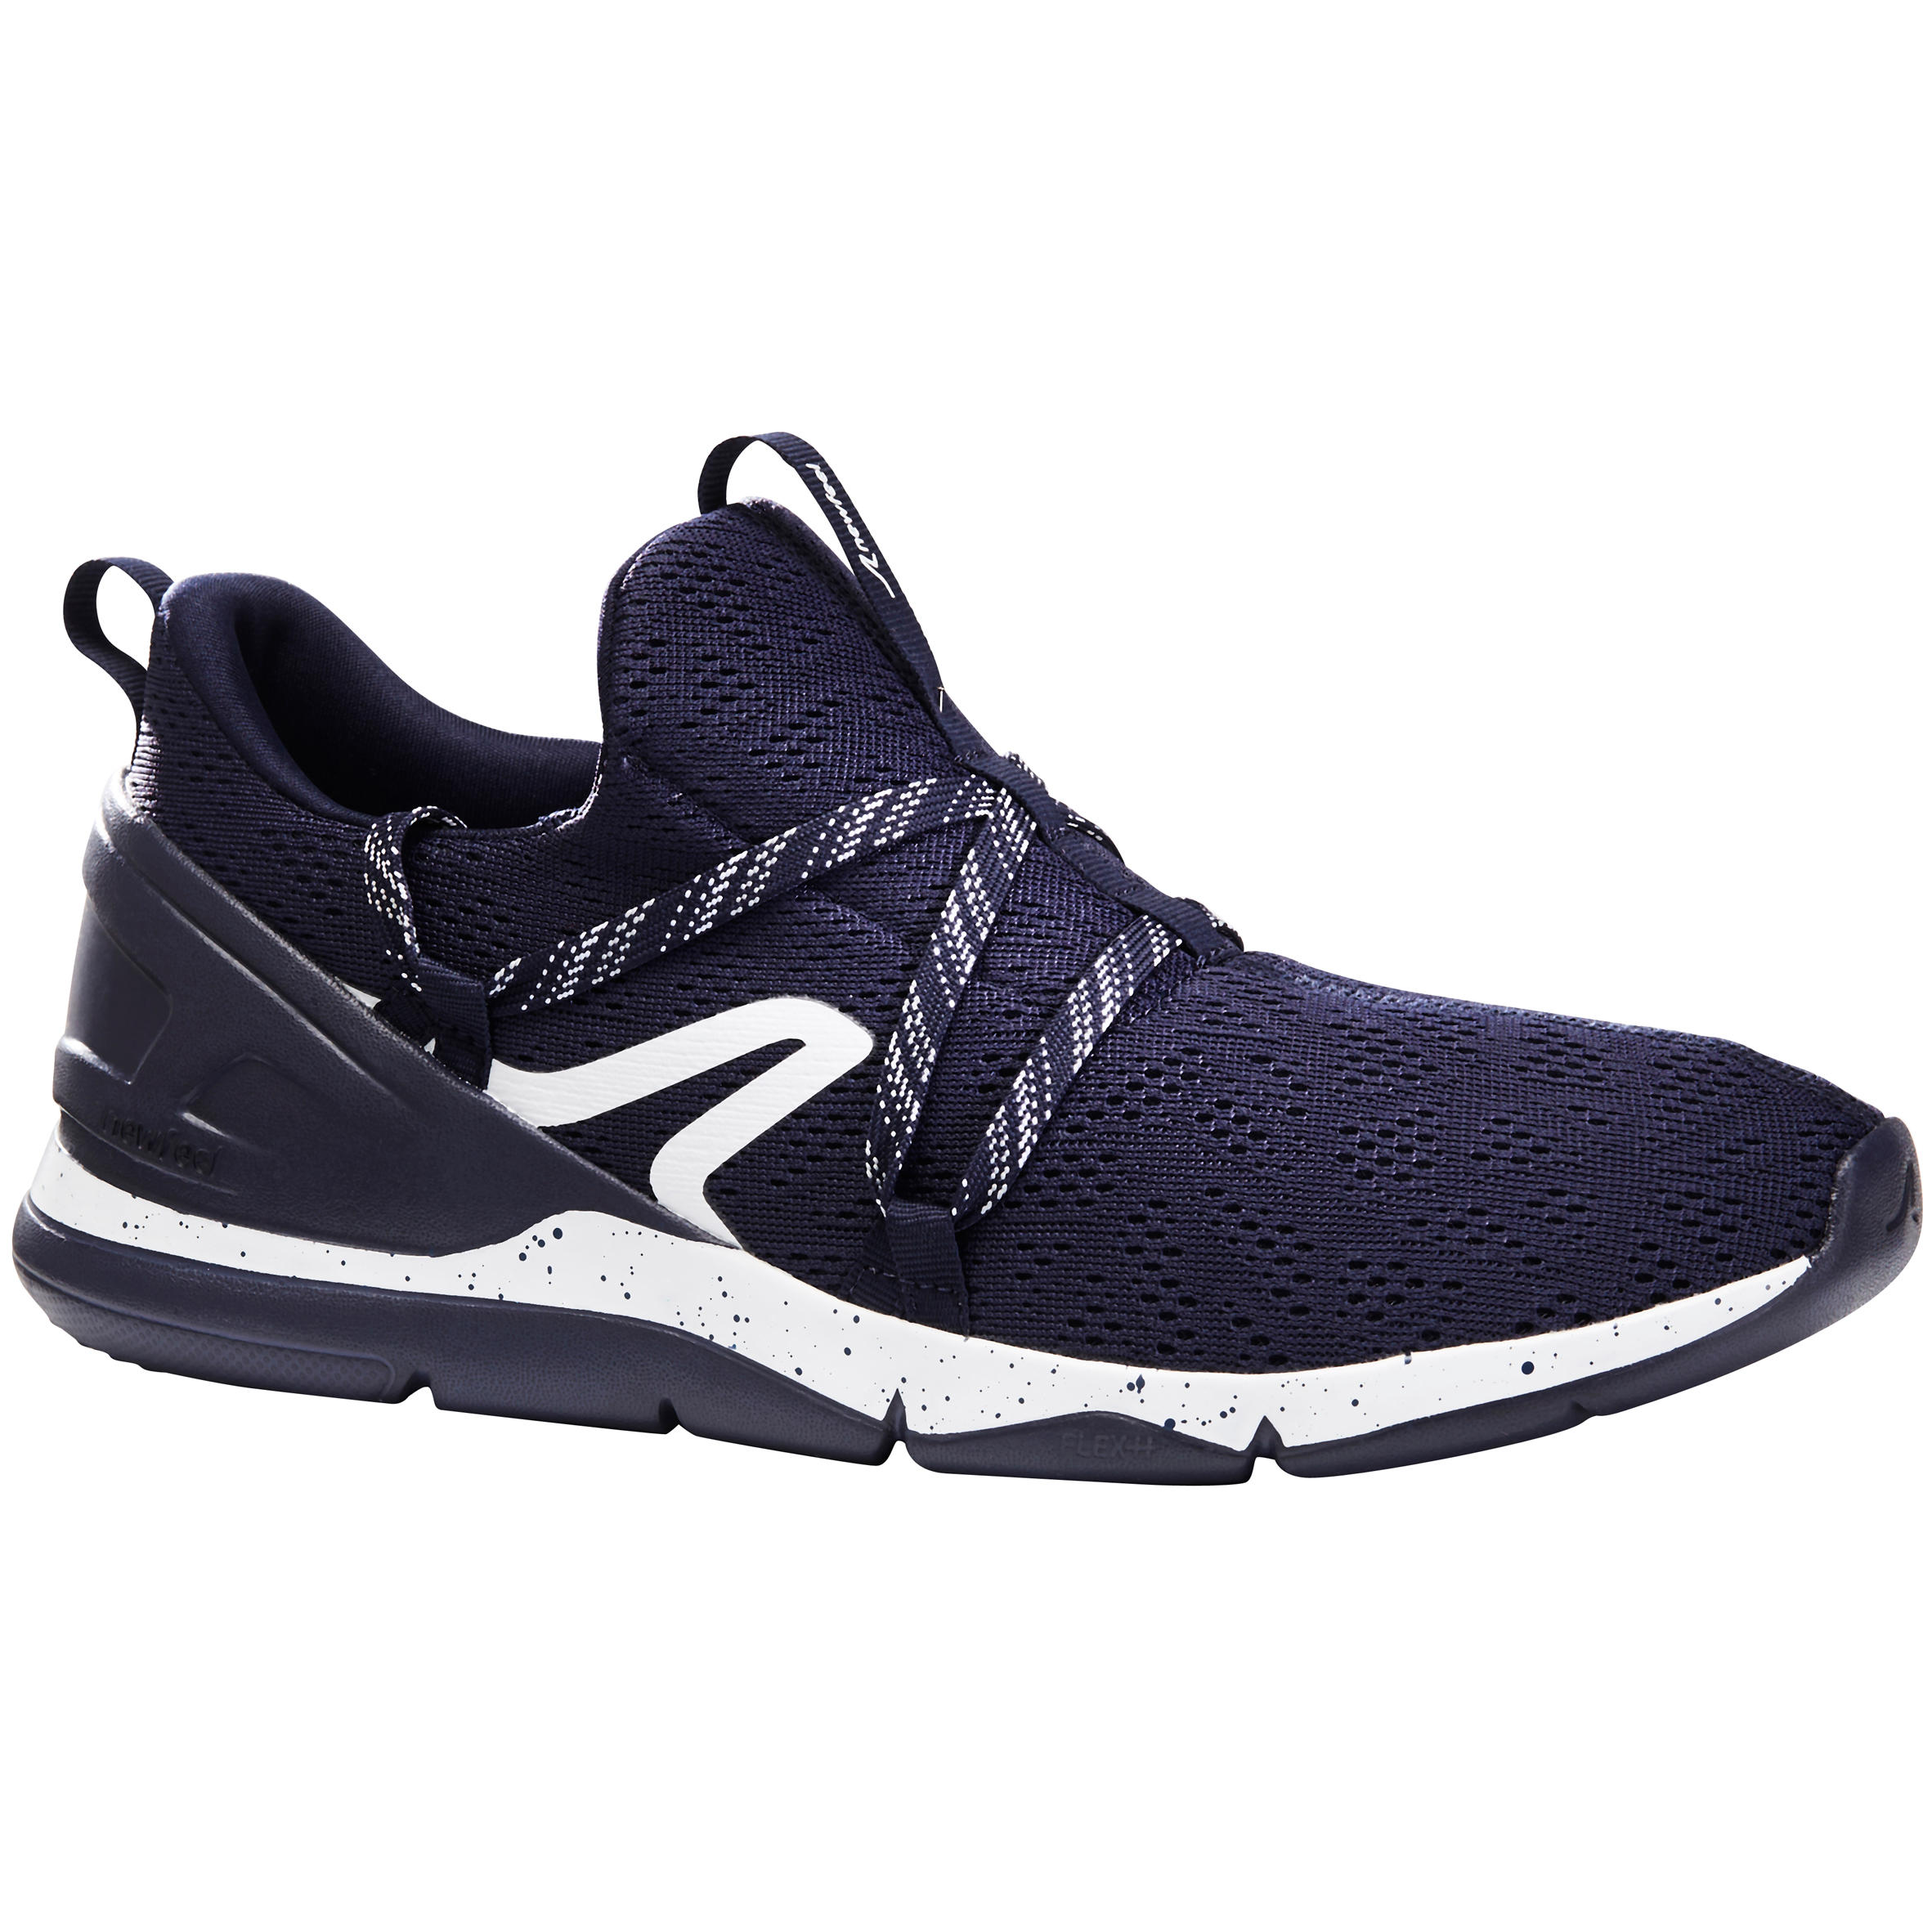 PW 140 Men's fitness walking shoes blue